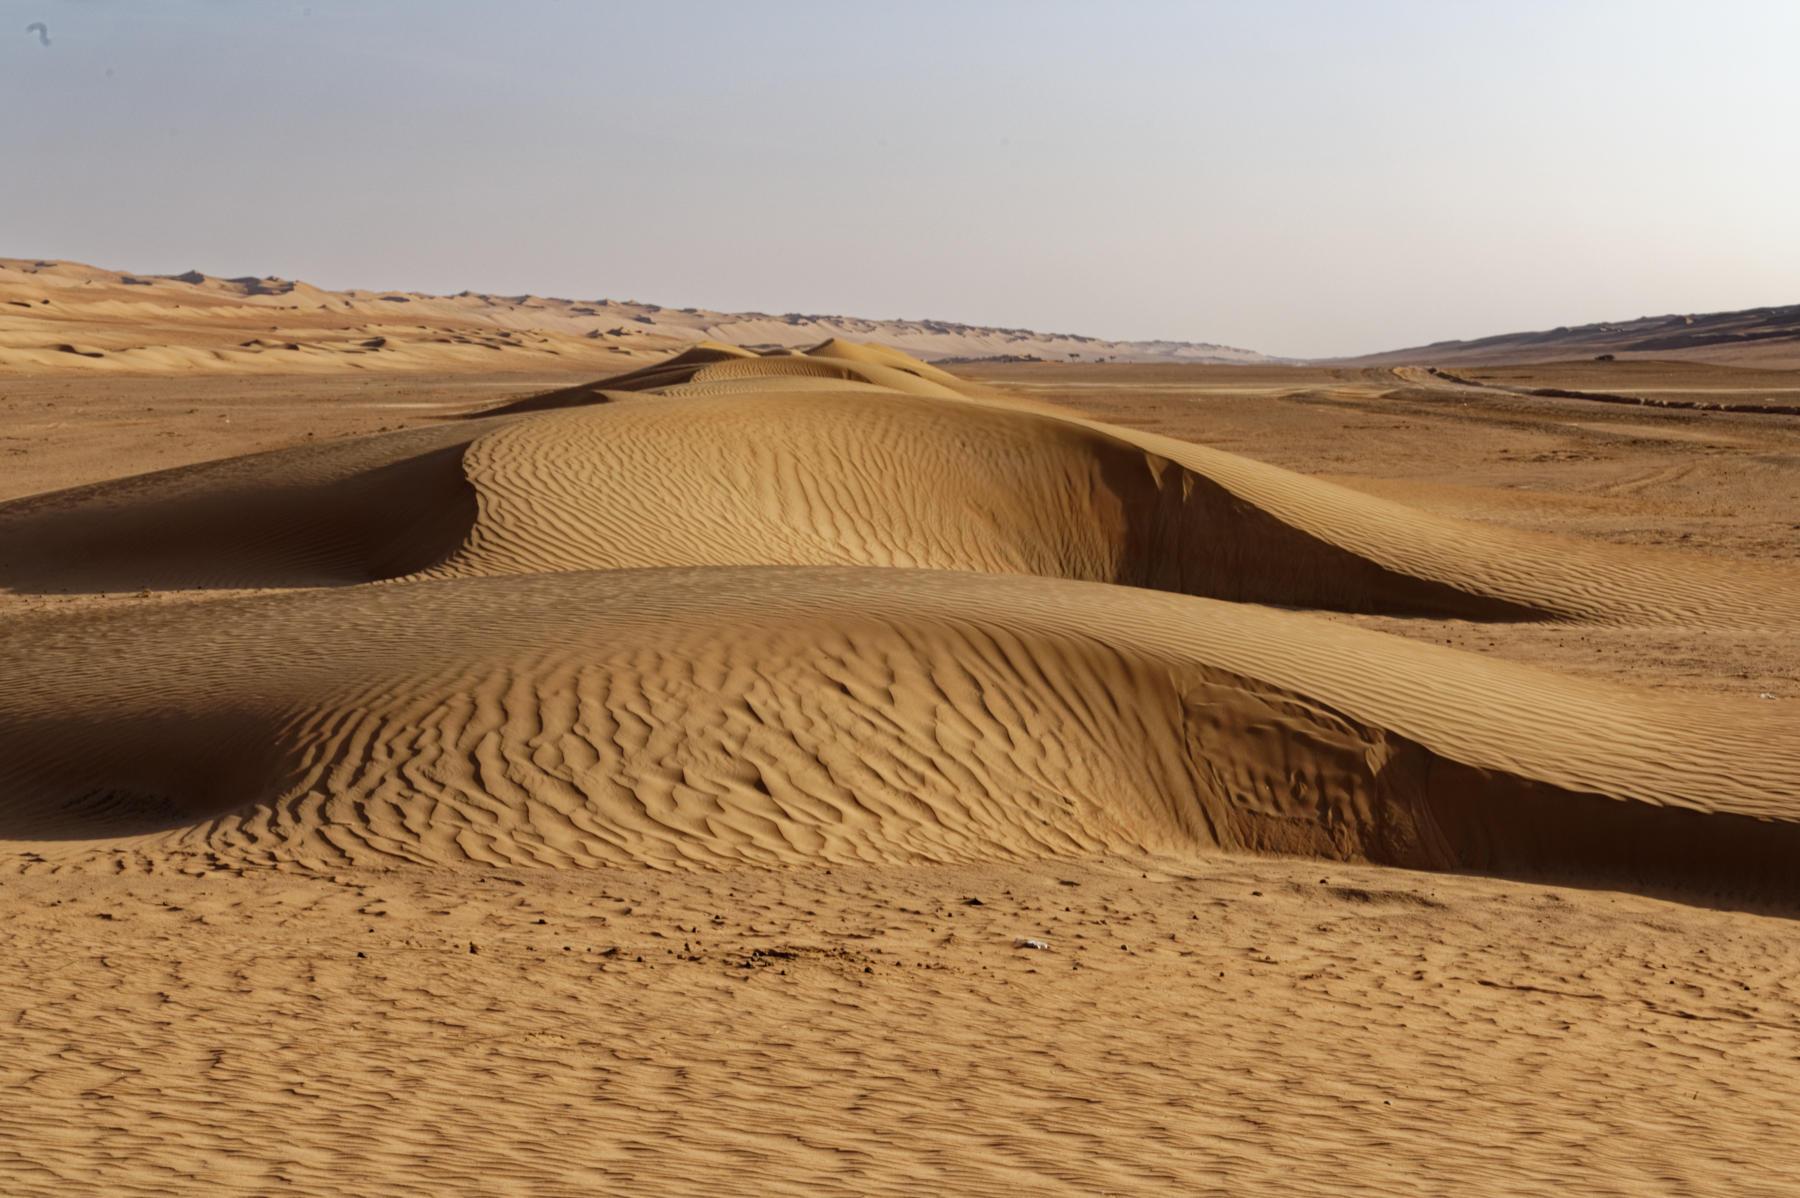 Wahiba sands, Oman desert